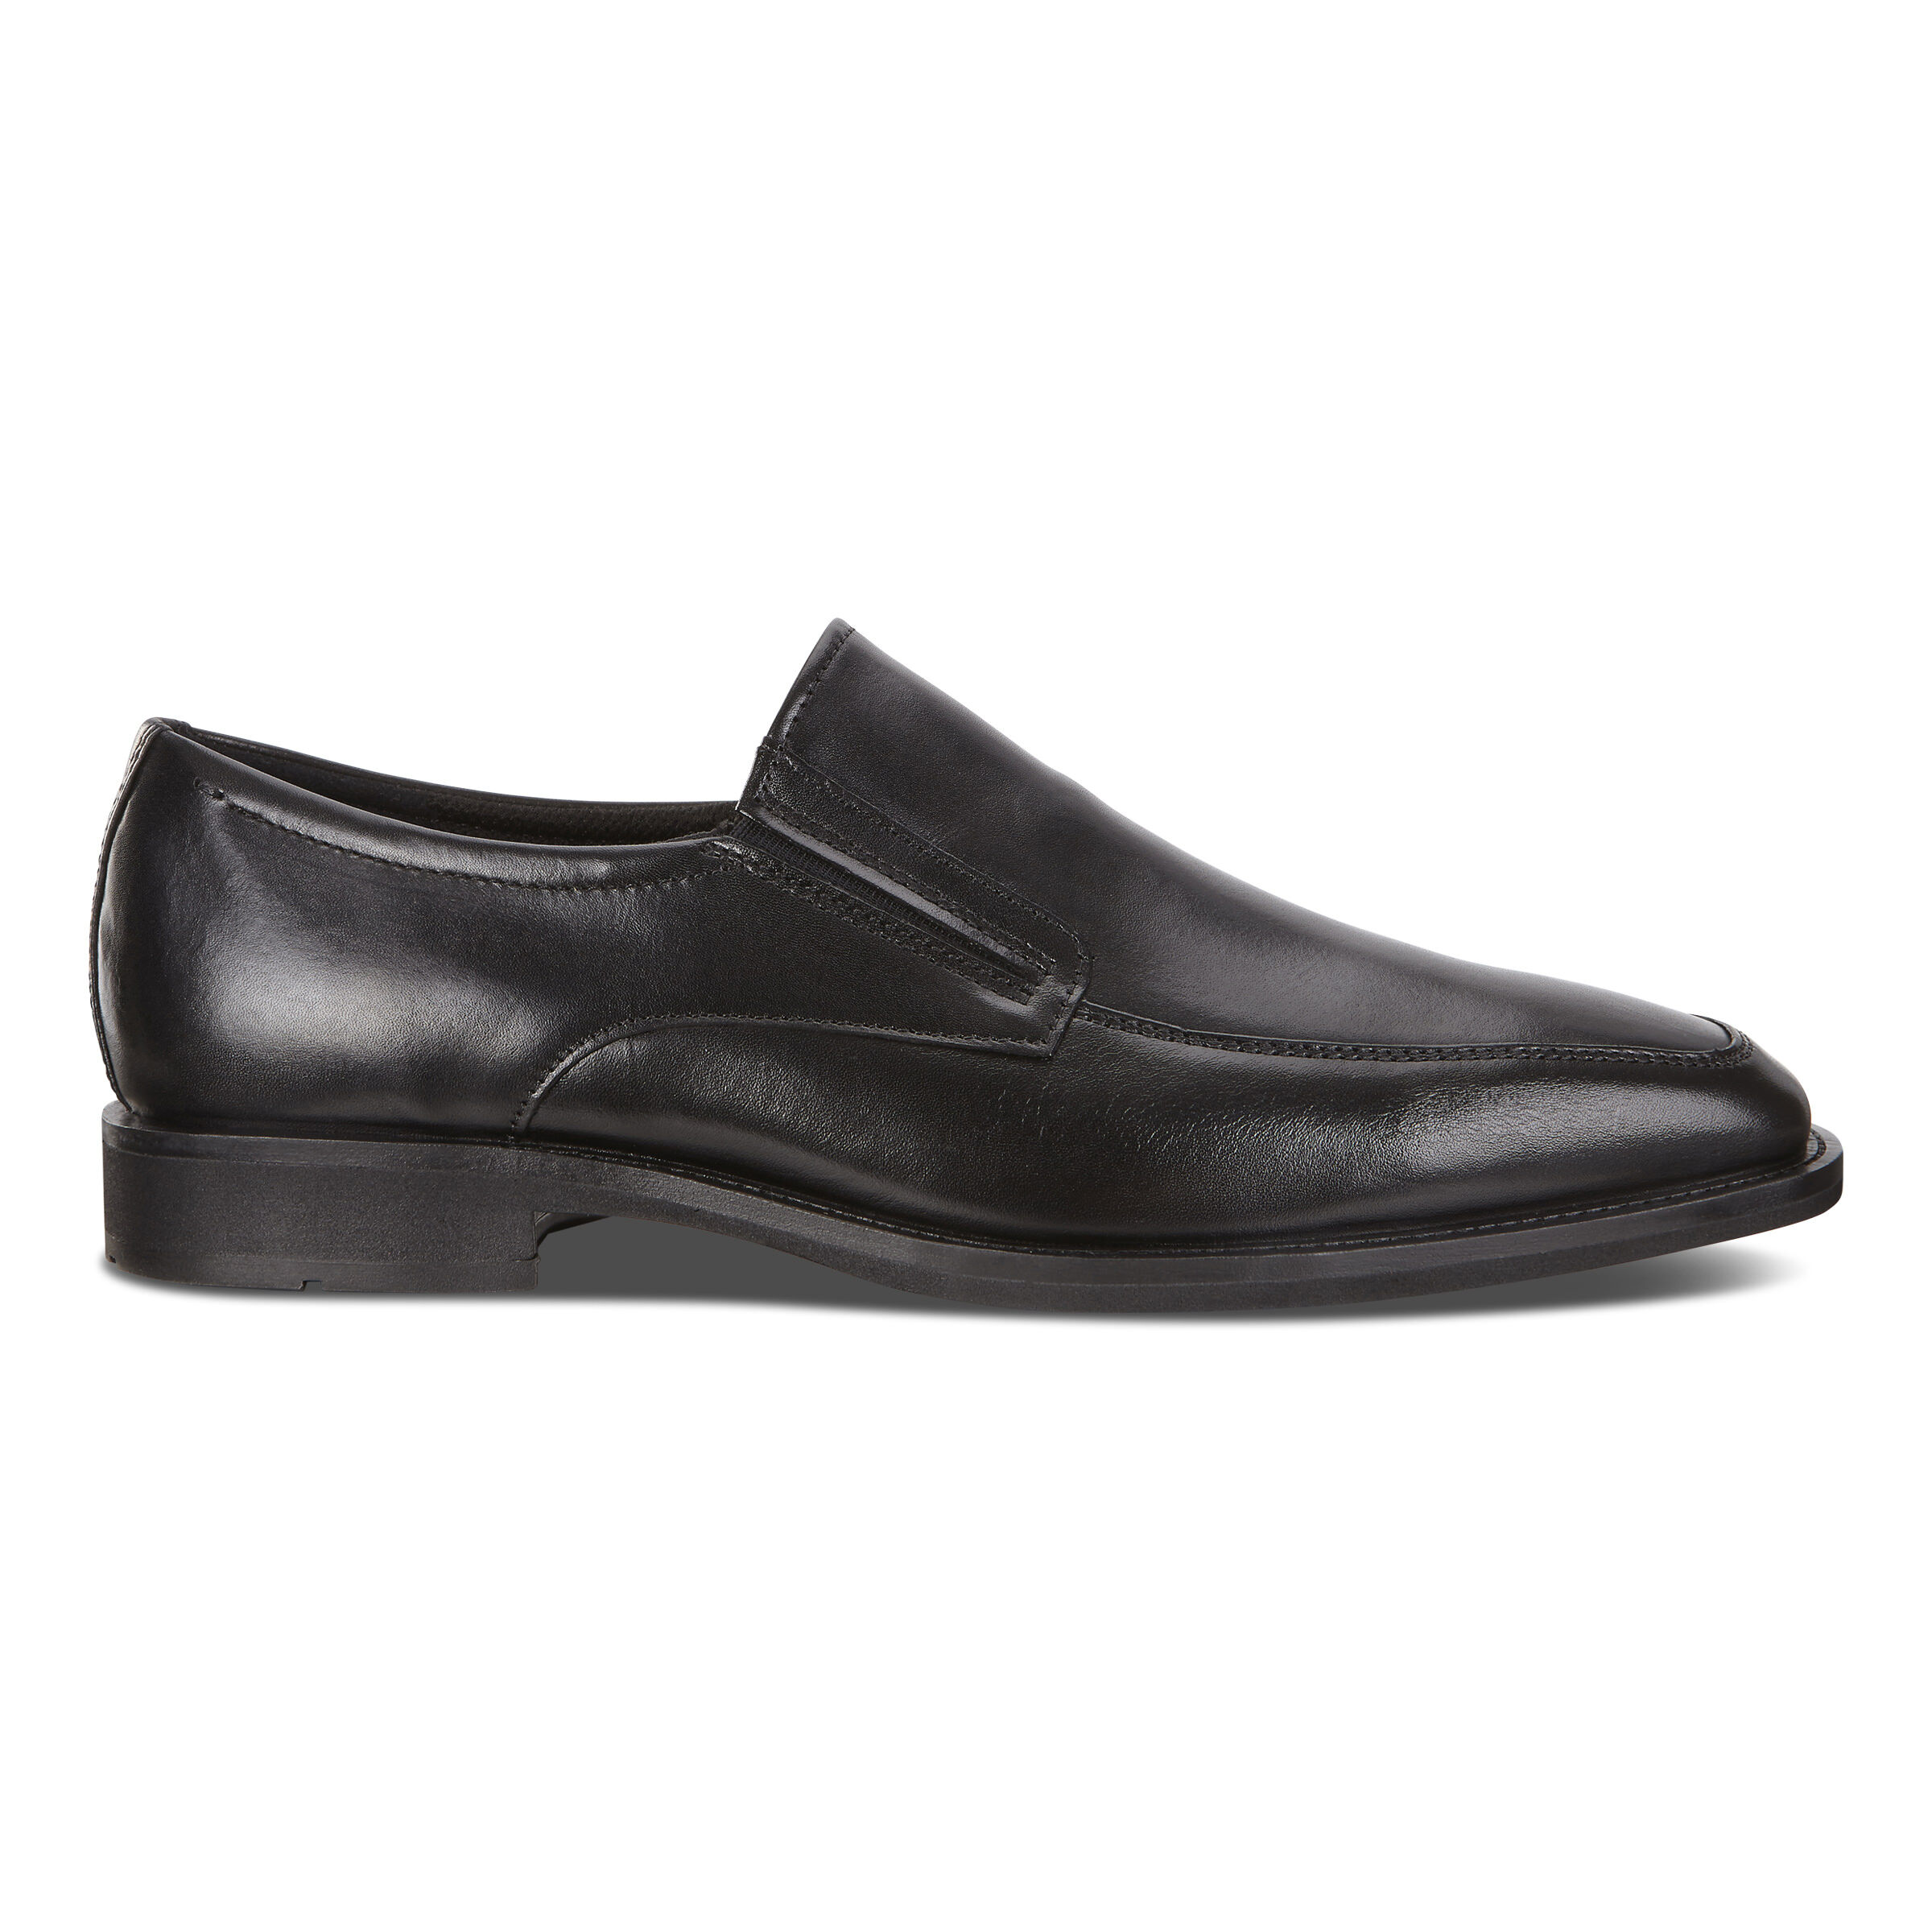 Sale: Shoes, Boots, Sandals \u0026 Leather